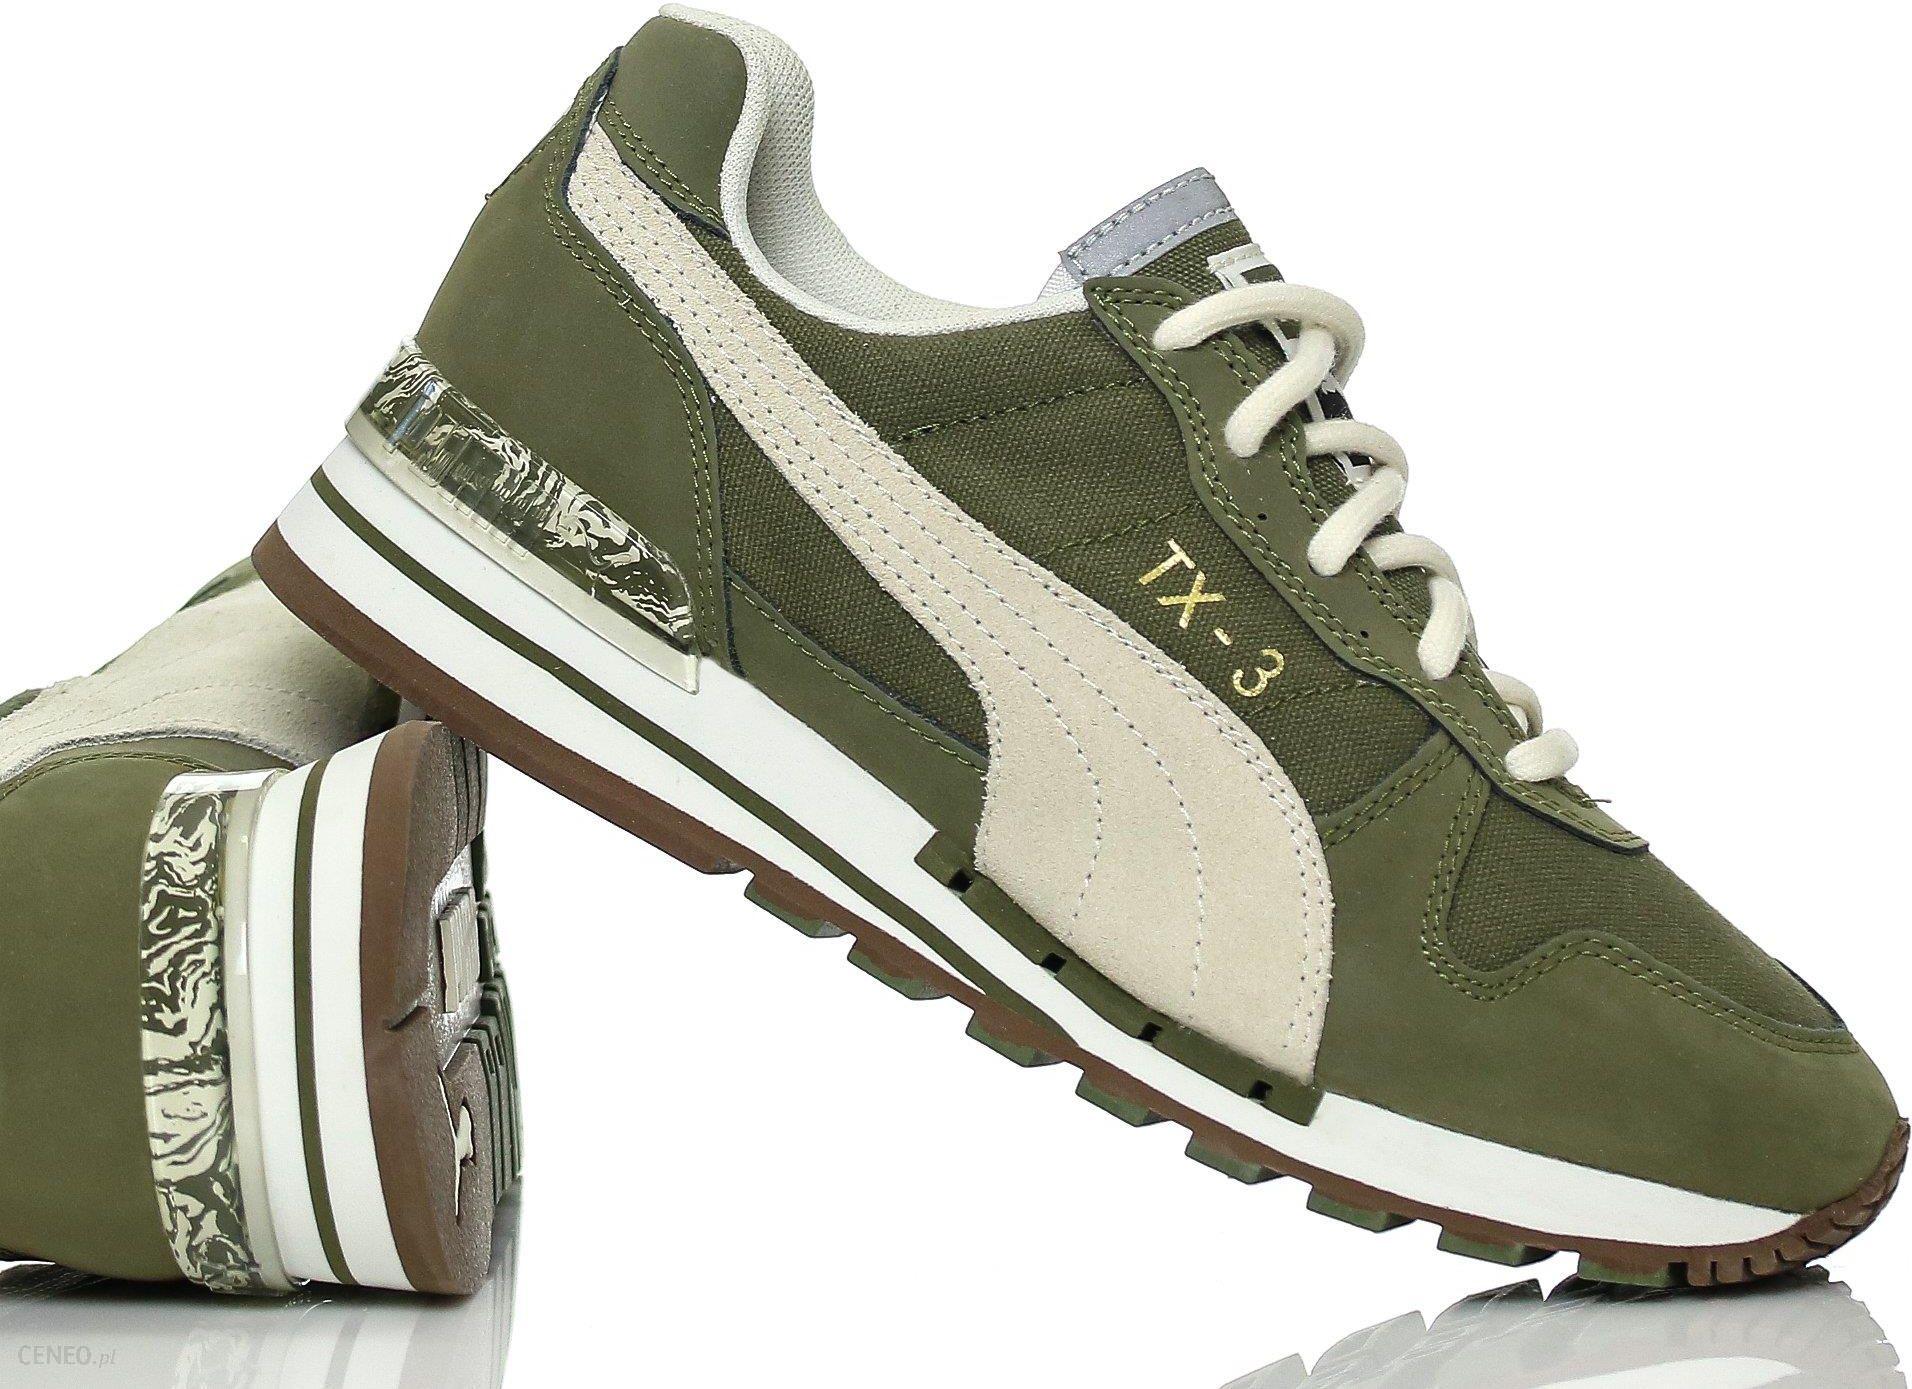 Buty damskie Puma TX 3 NC Swirl 357293 01 Różne r.